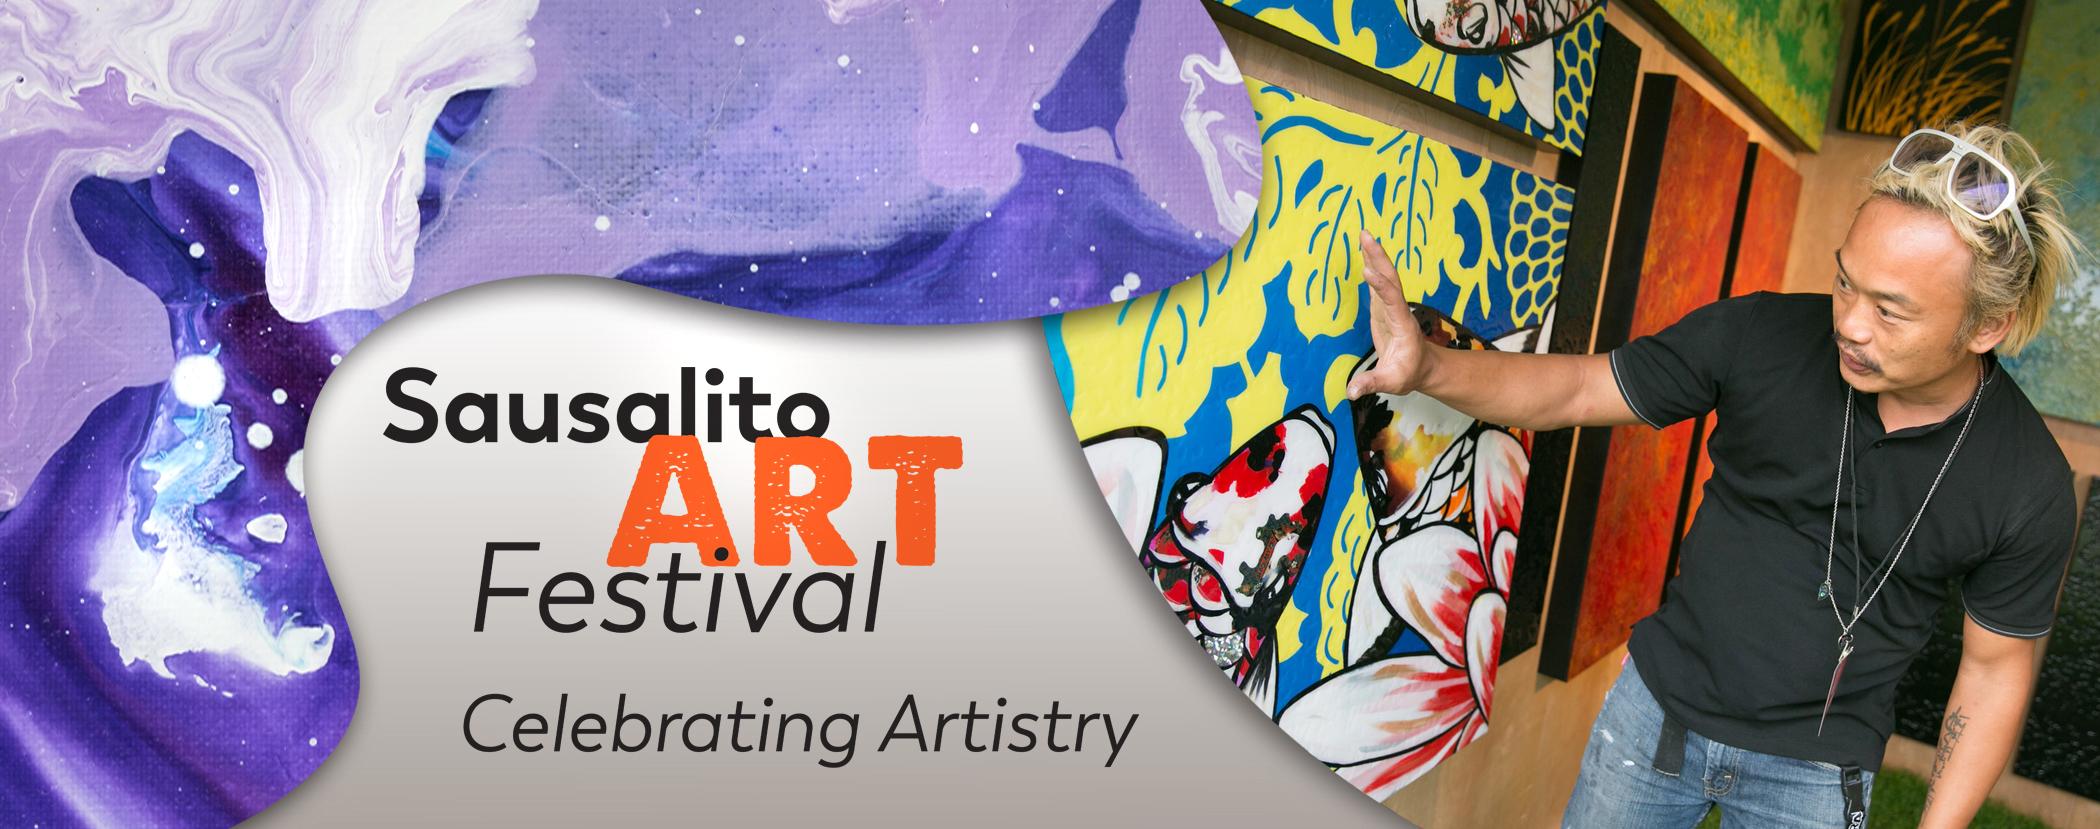 Sausalito Art Festival 2020 Sausalito Art Festival